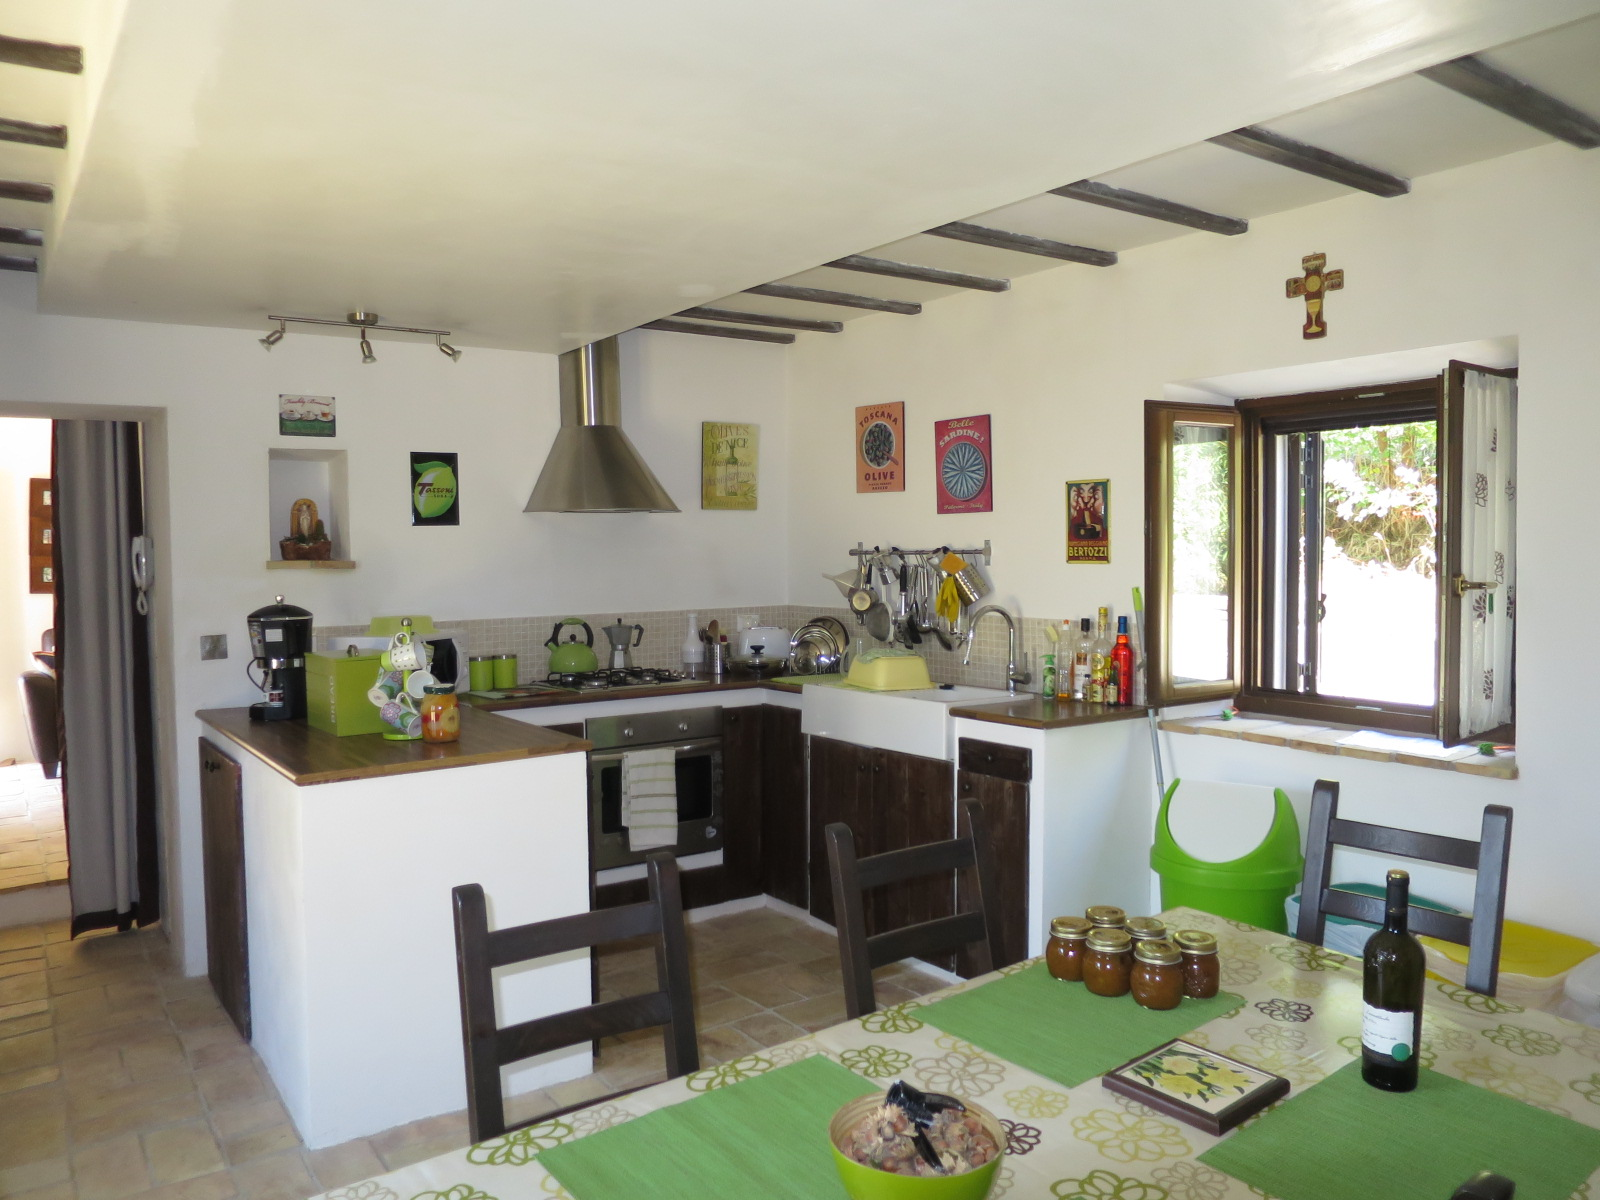 Country Houses Country Houses for sale Montefino (TE), Casa Collina - Montefino - EUR 151.447 290